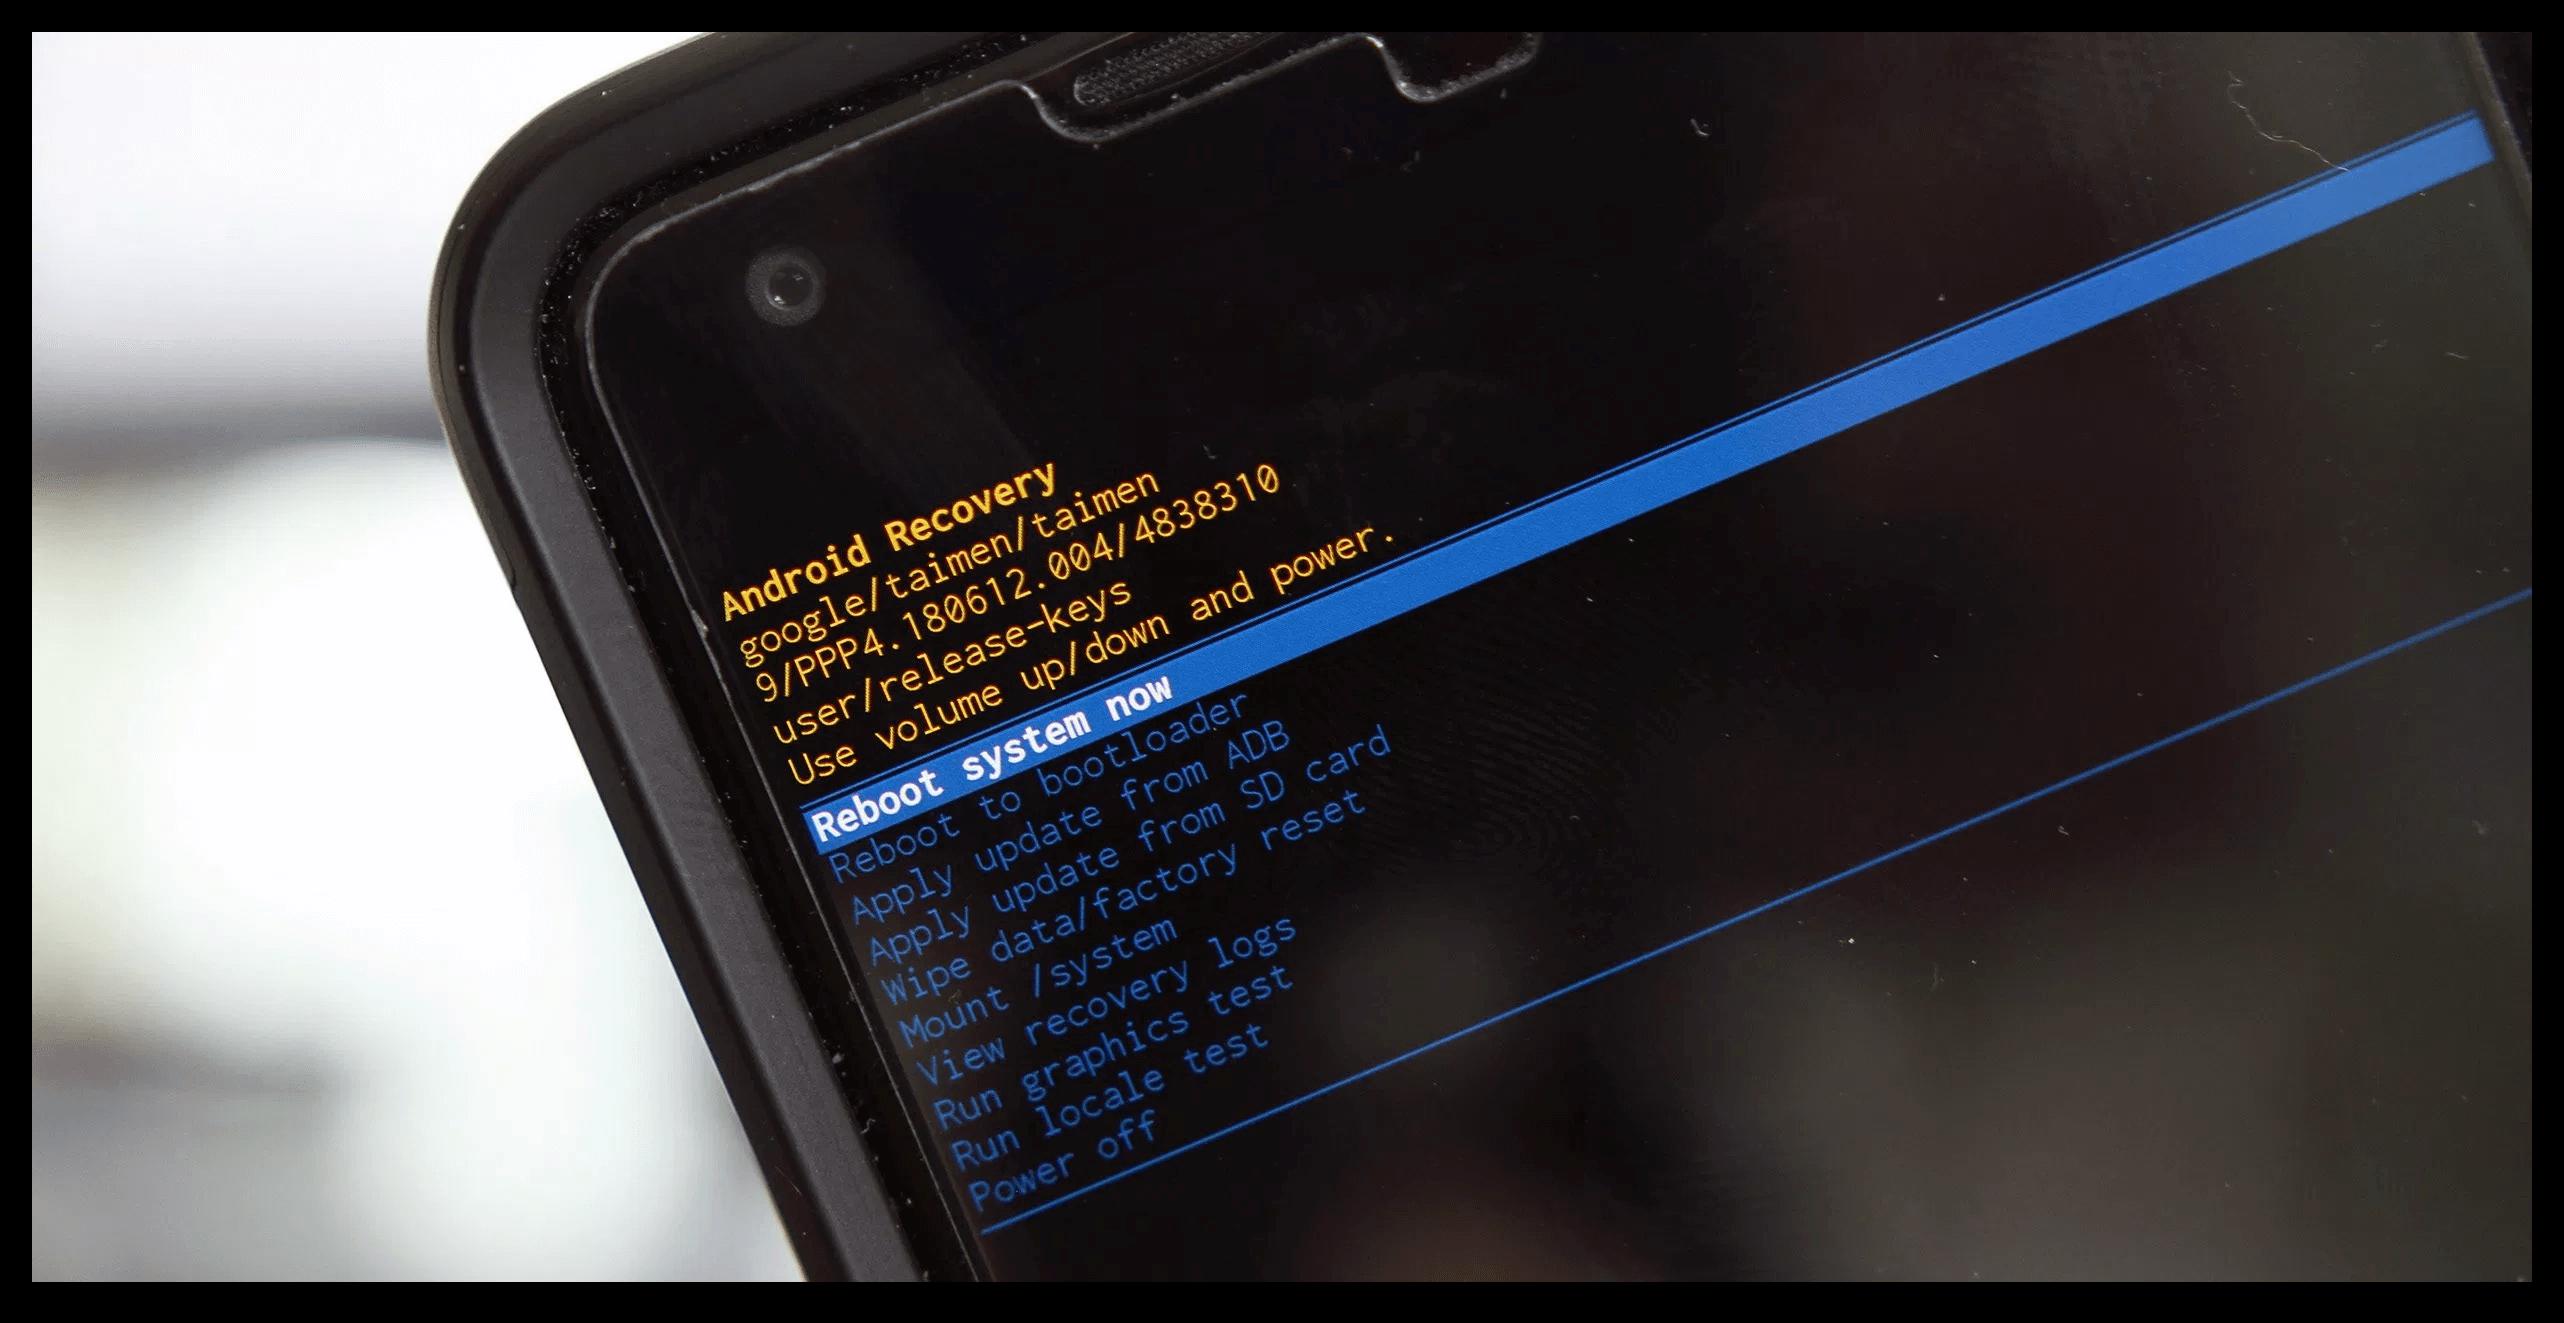 sistemnoe-menyu-android.png